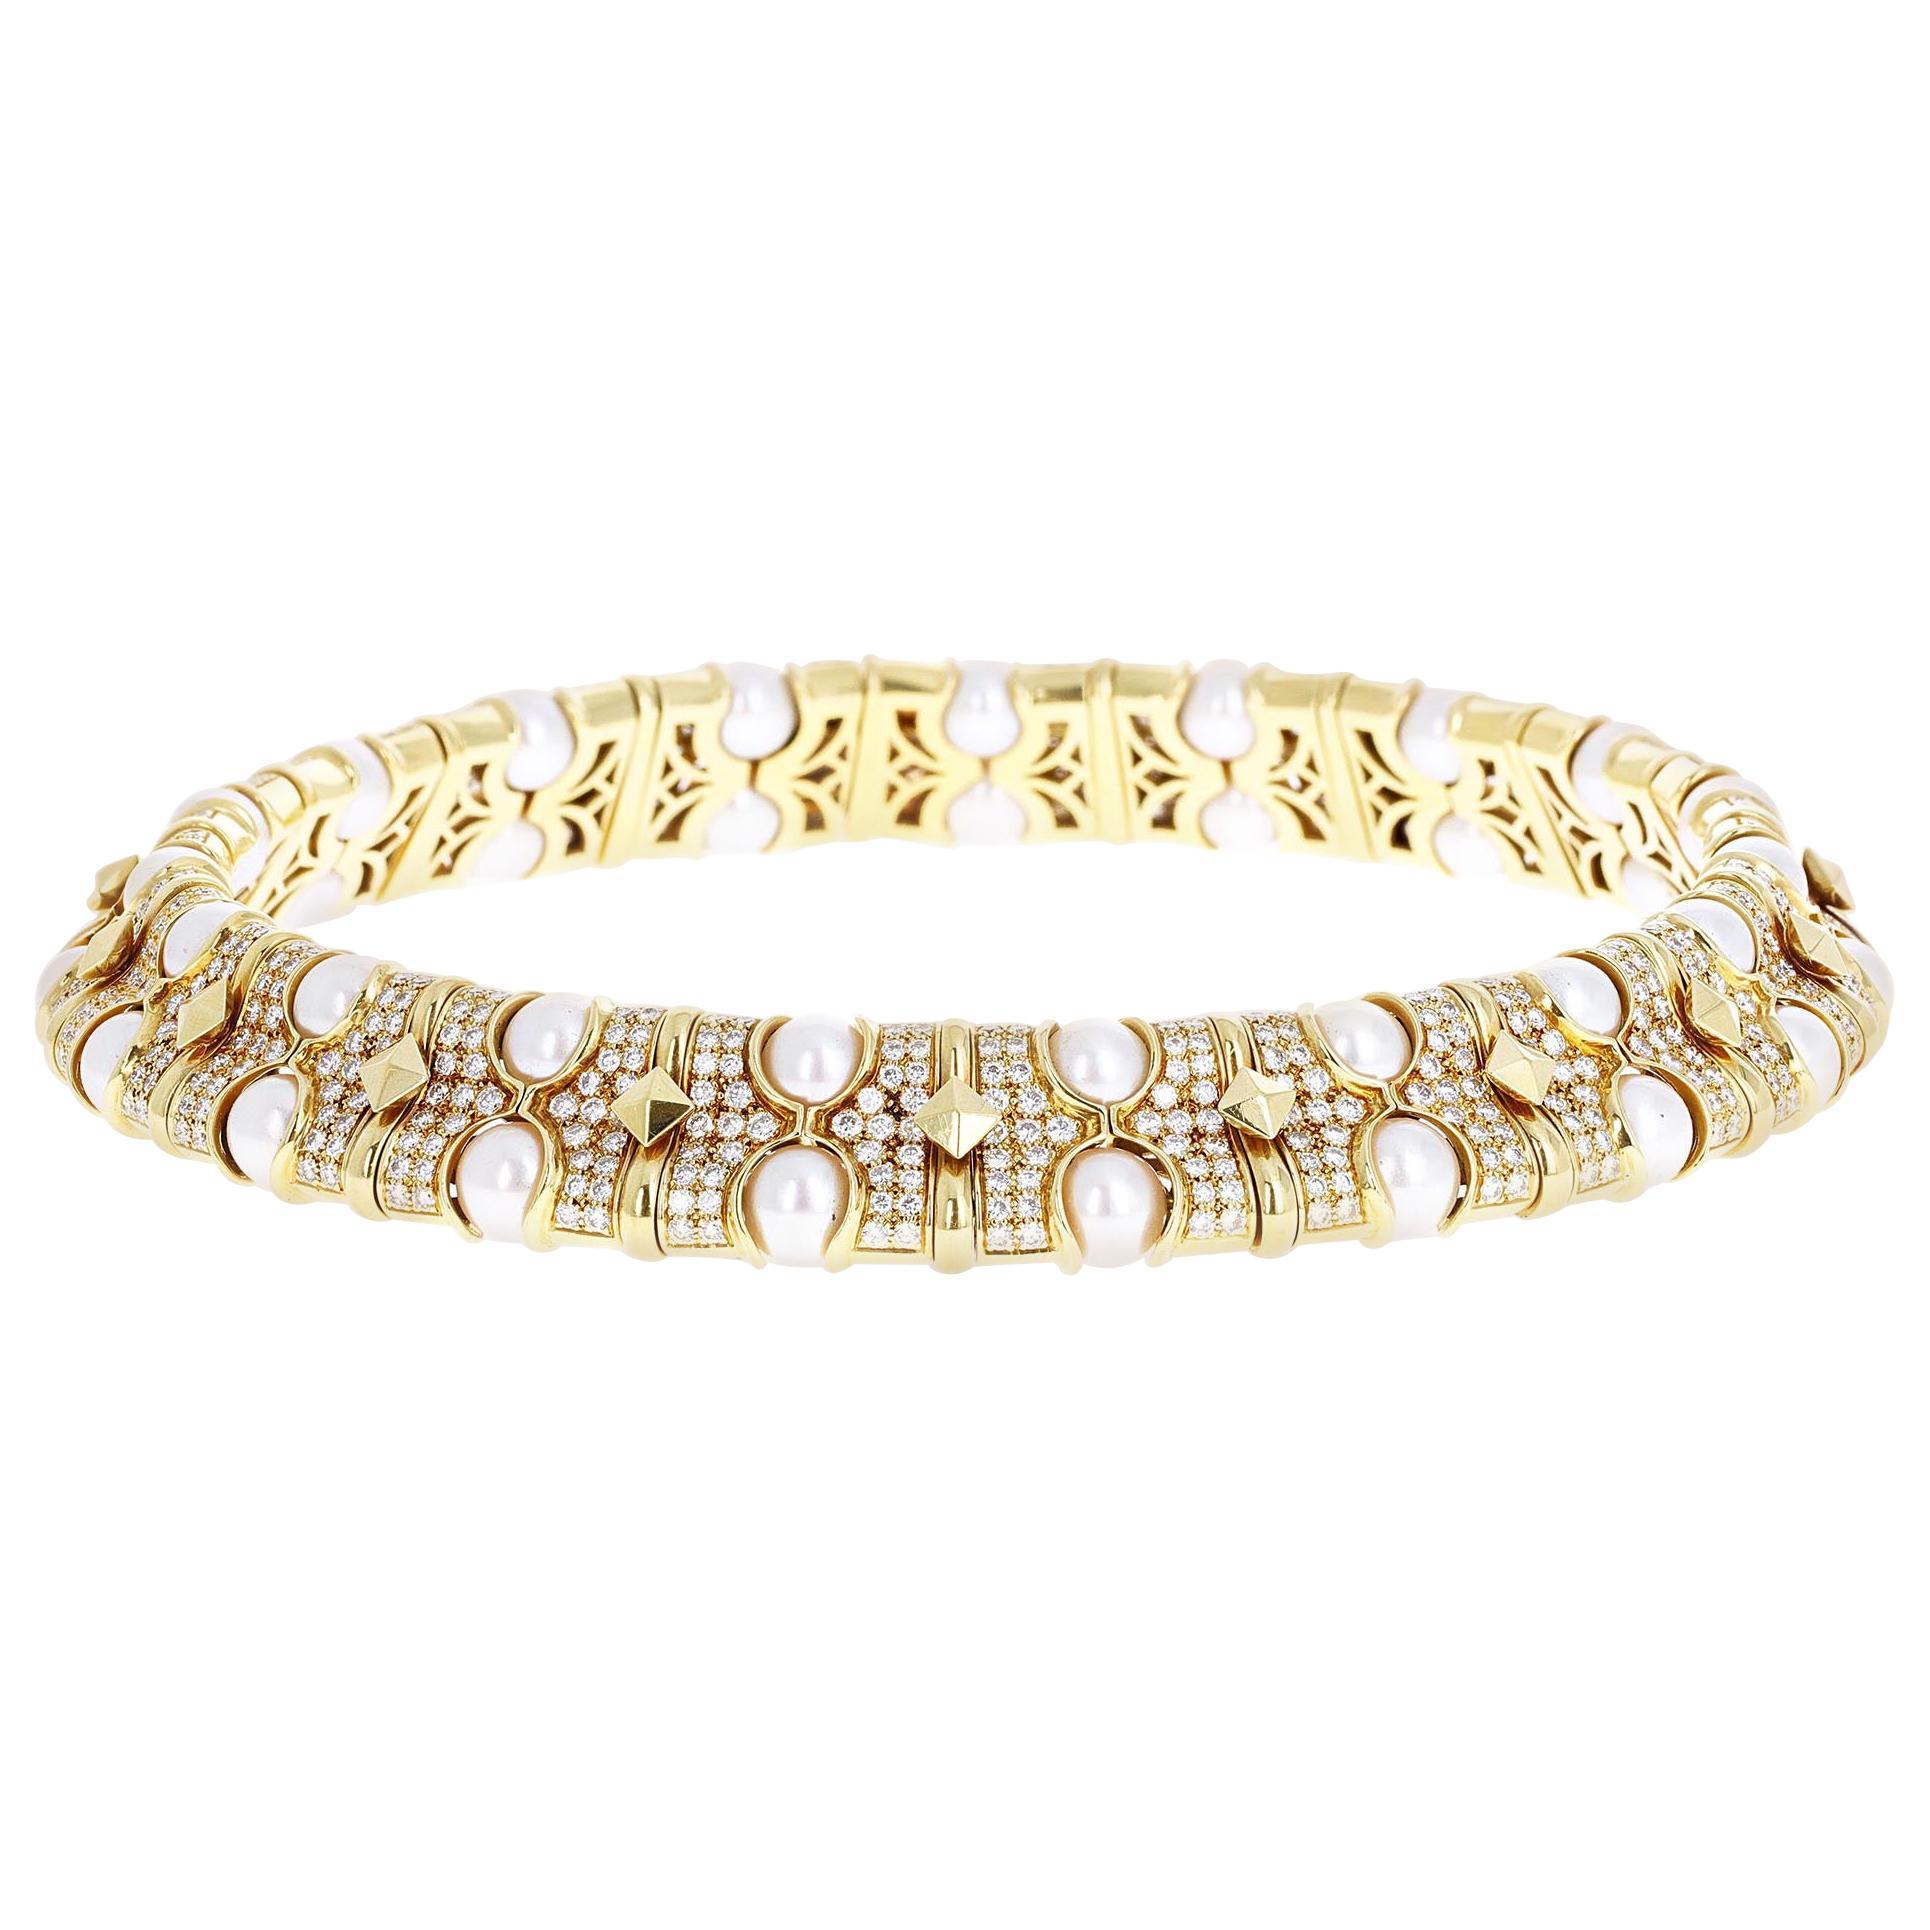 Retro 21.78 Carat Diamond and Pearl Collar Necklace